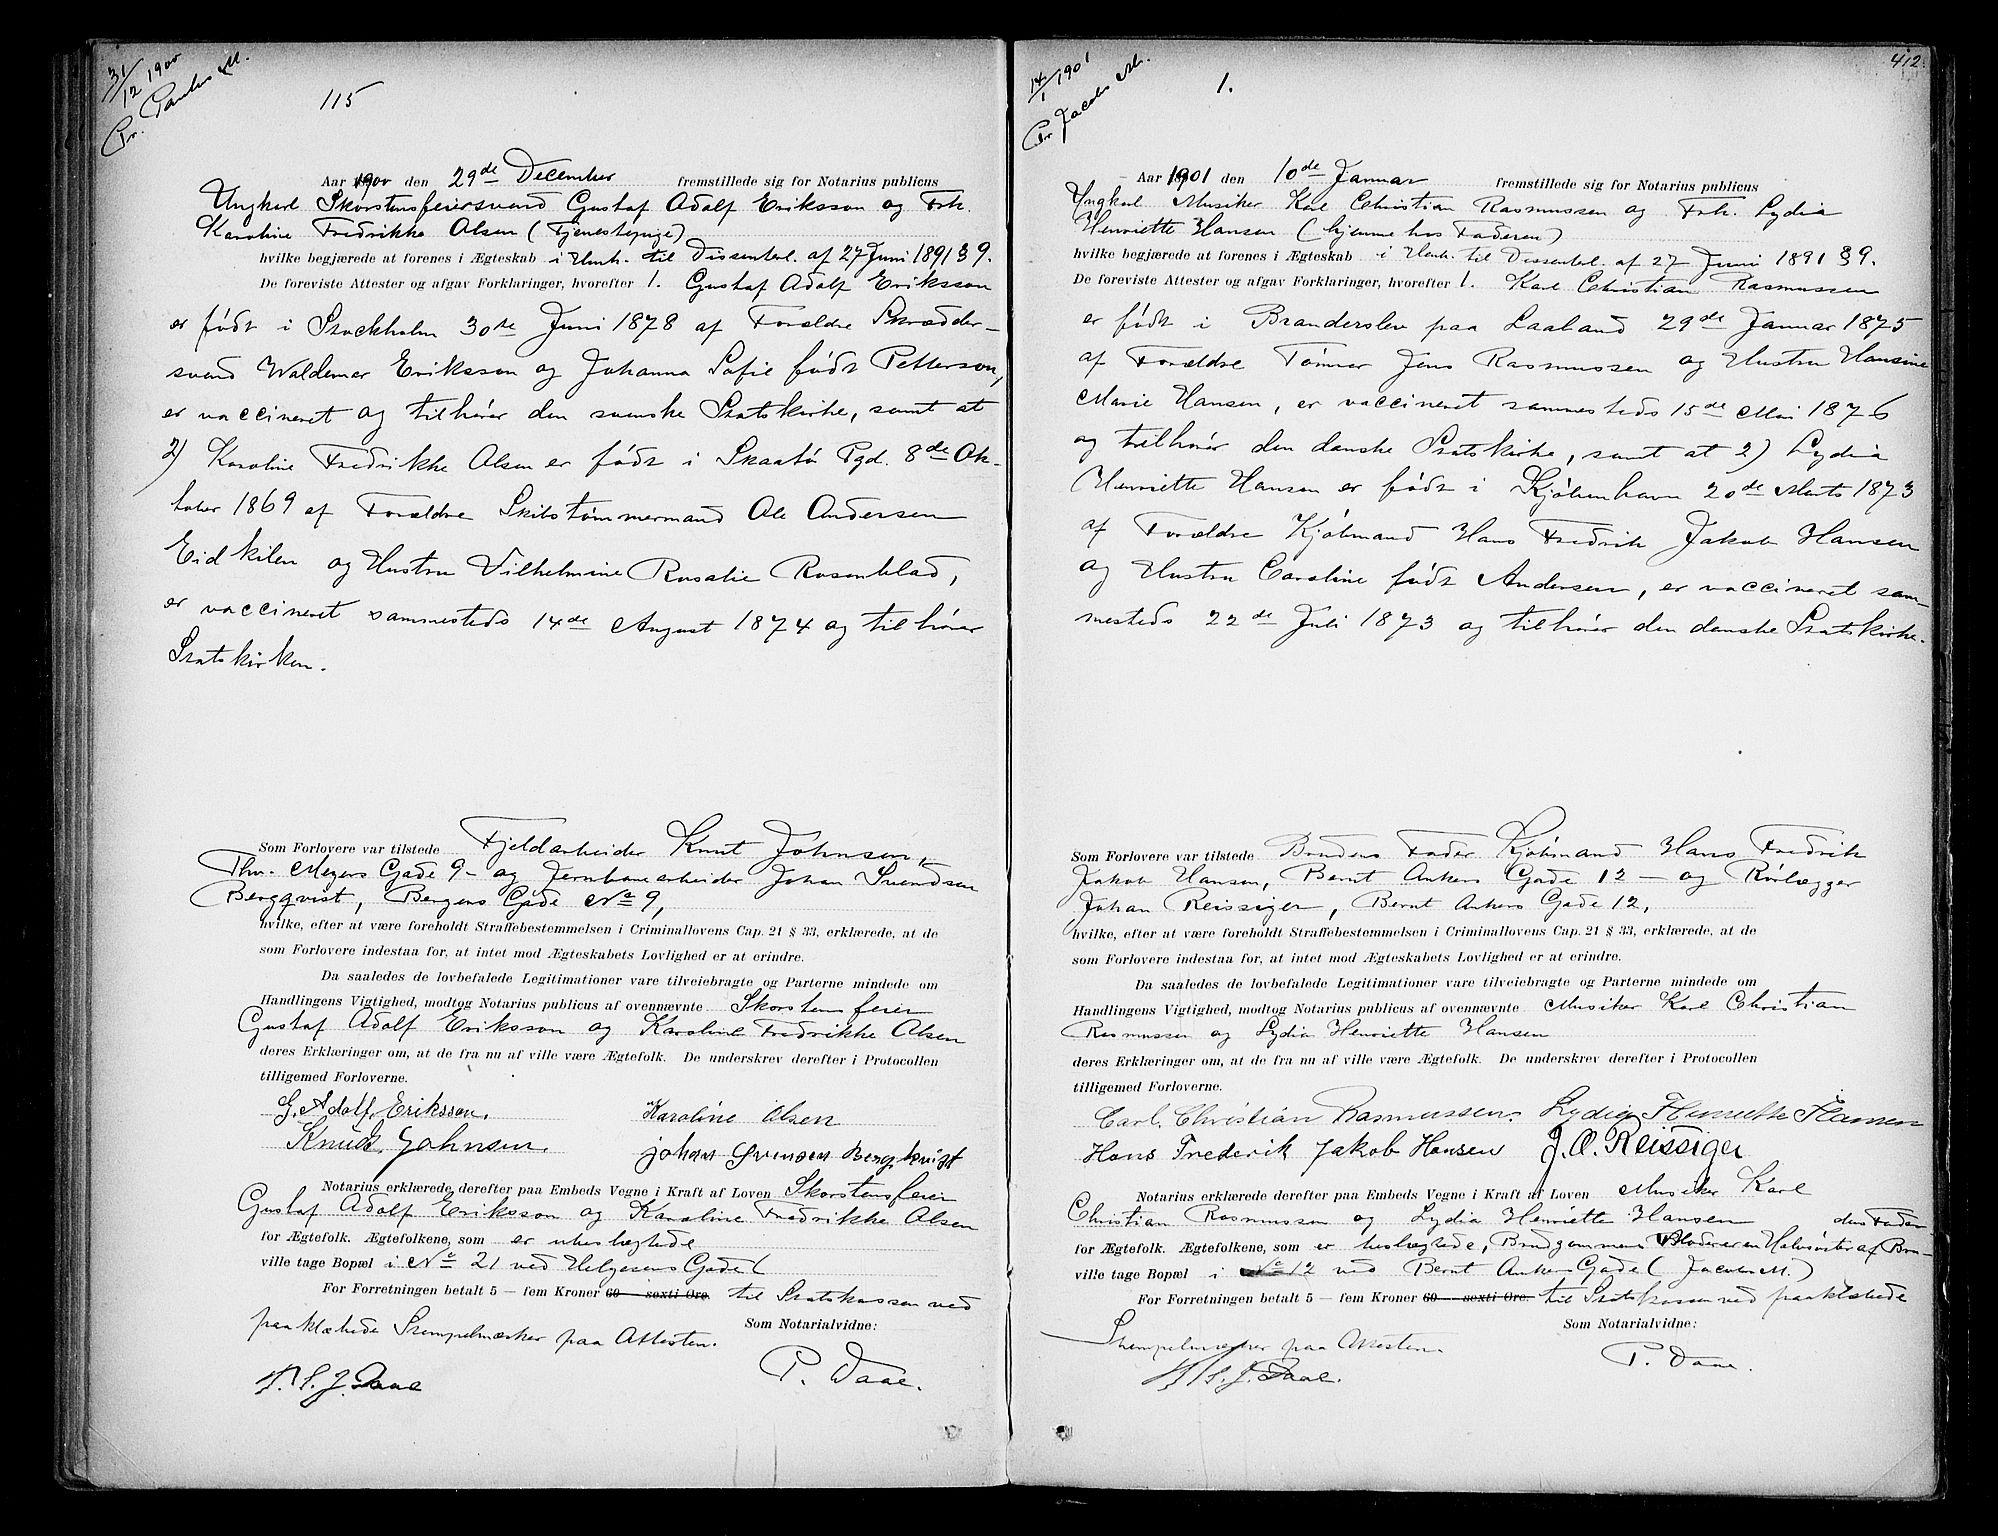 SAO, Oslo byfogd avd. I, L/Lb/Lbb/L0005: Notarialprotokoll, rekke II: Vigsler, 1897-1902, s. 411b-412a